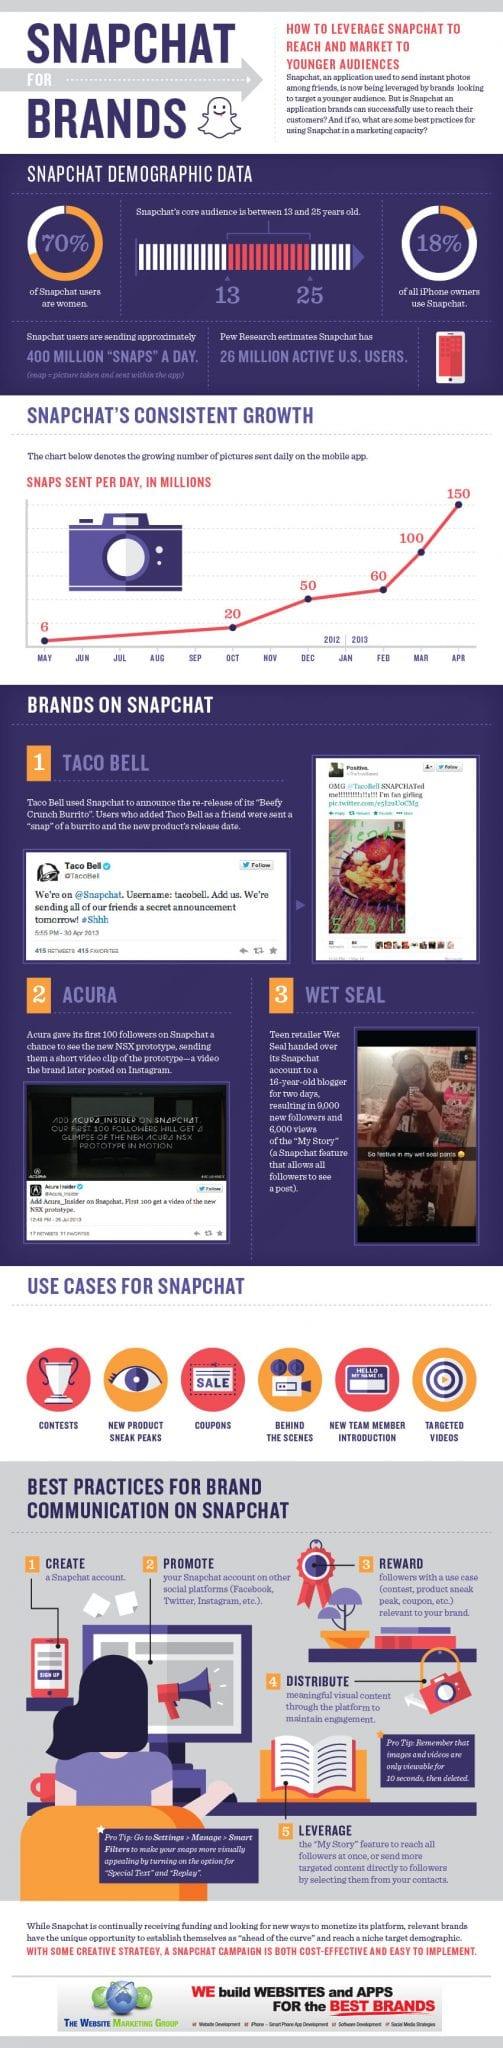 snapchat-infographic-2014